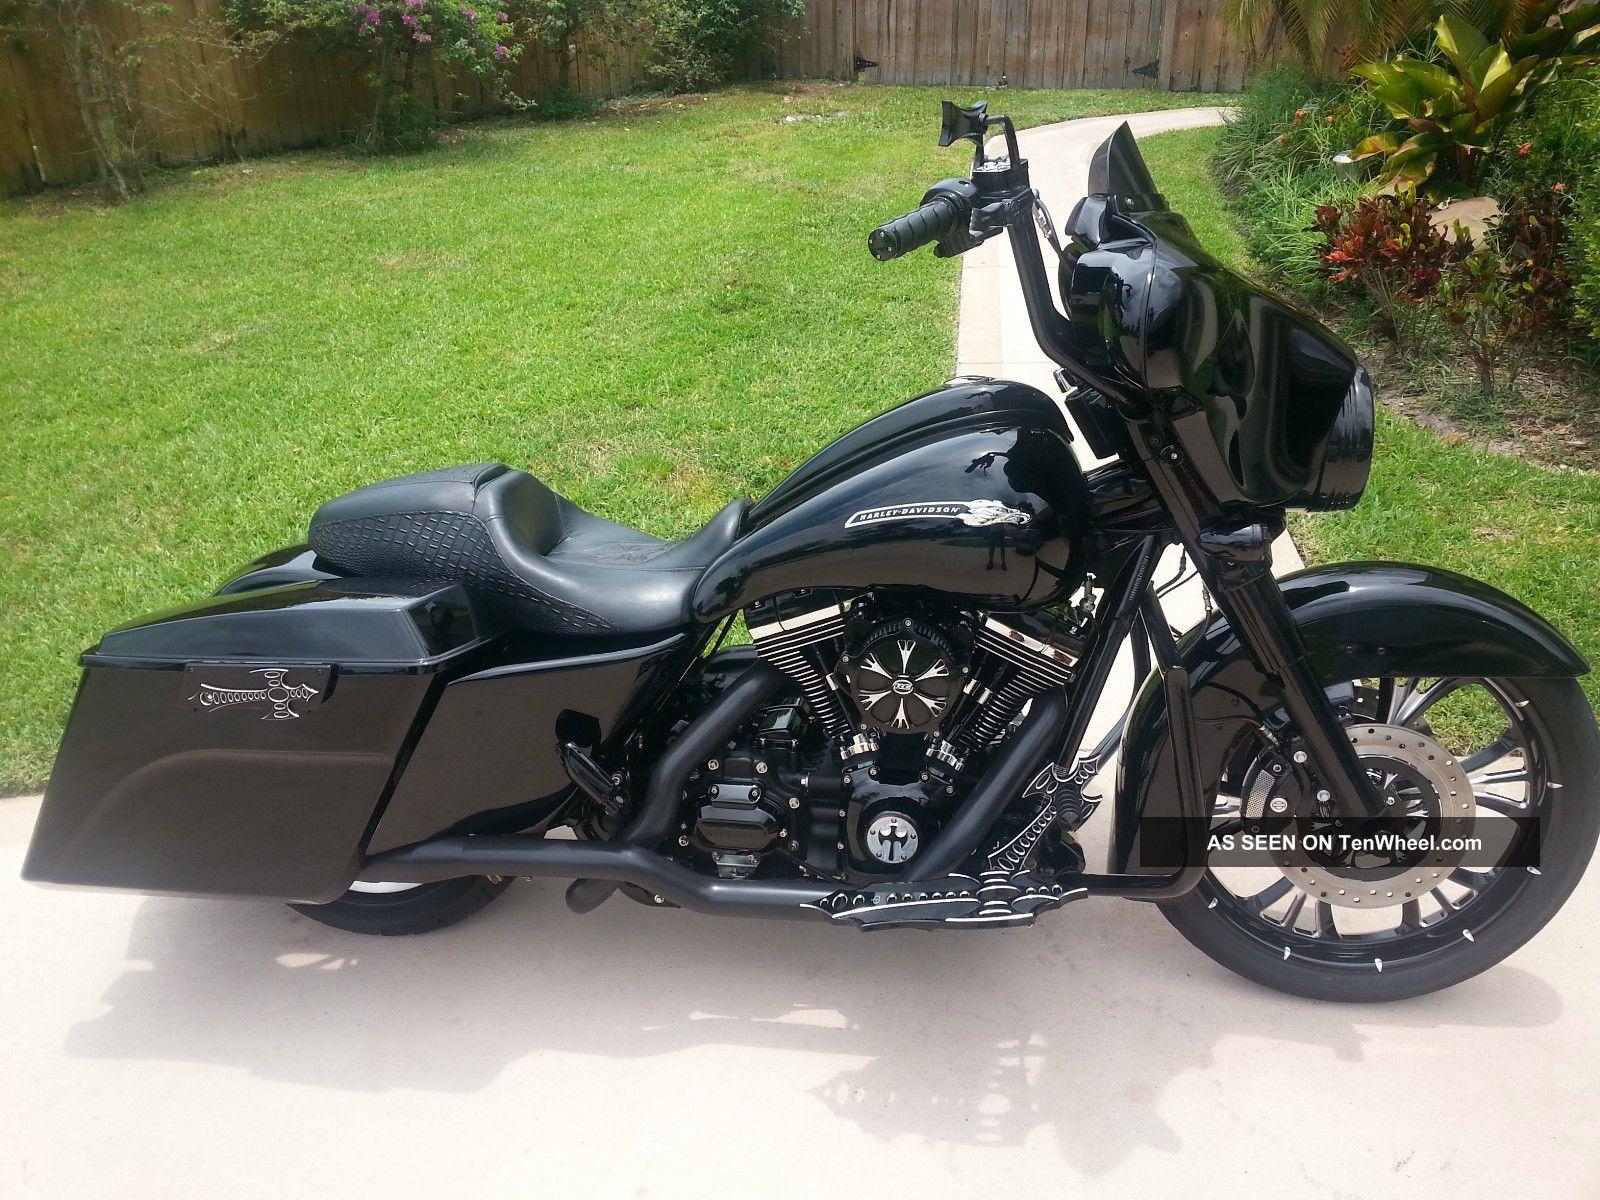 2011 Harley Street Glide Custom Bagger Touring photo